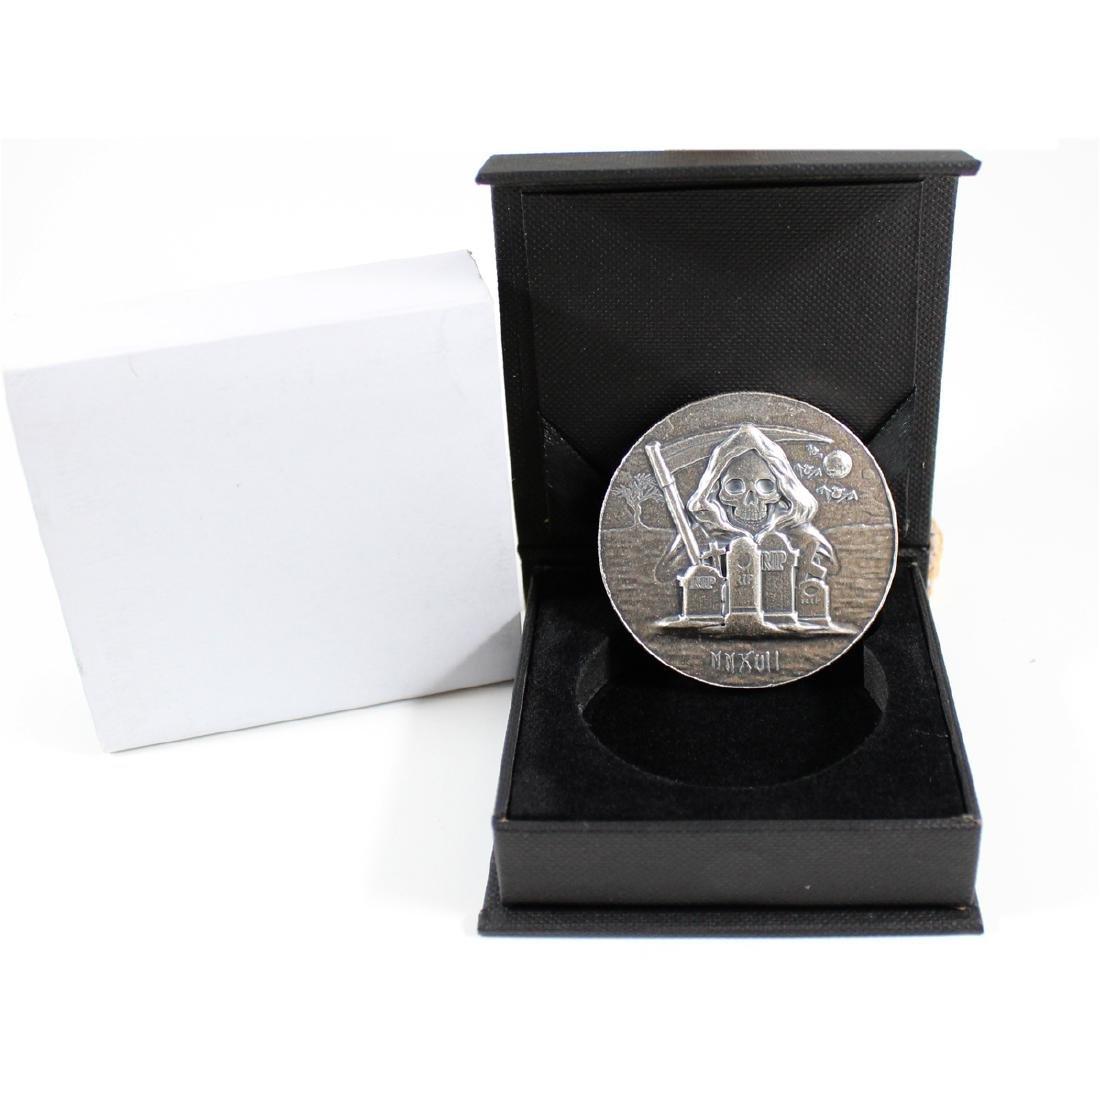 2017 Monarch Precious Metals 5 oz 999 Fine Silver Round